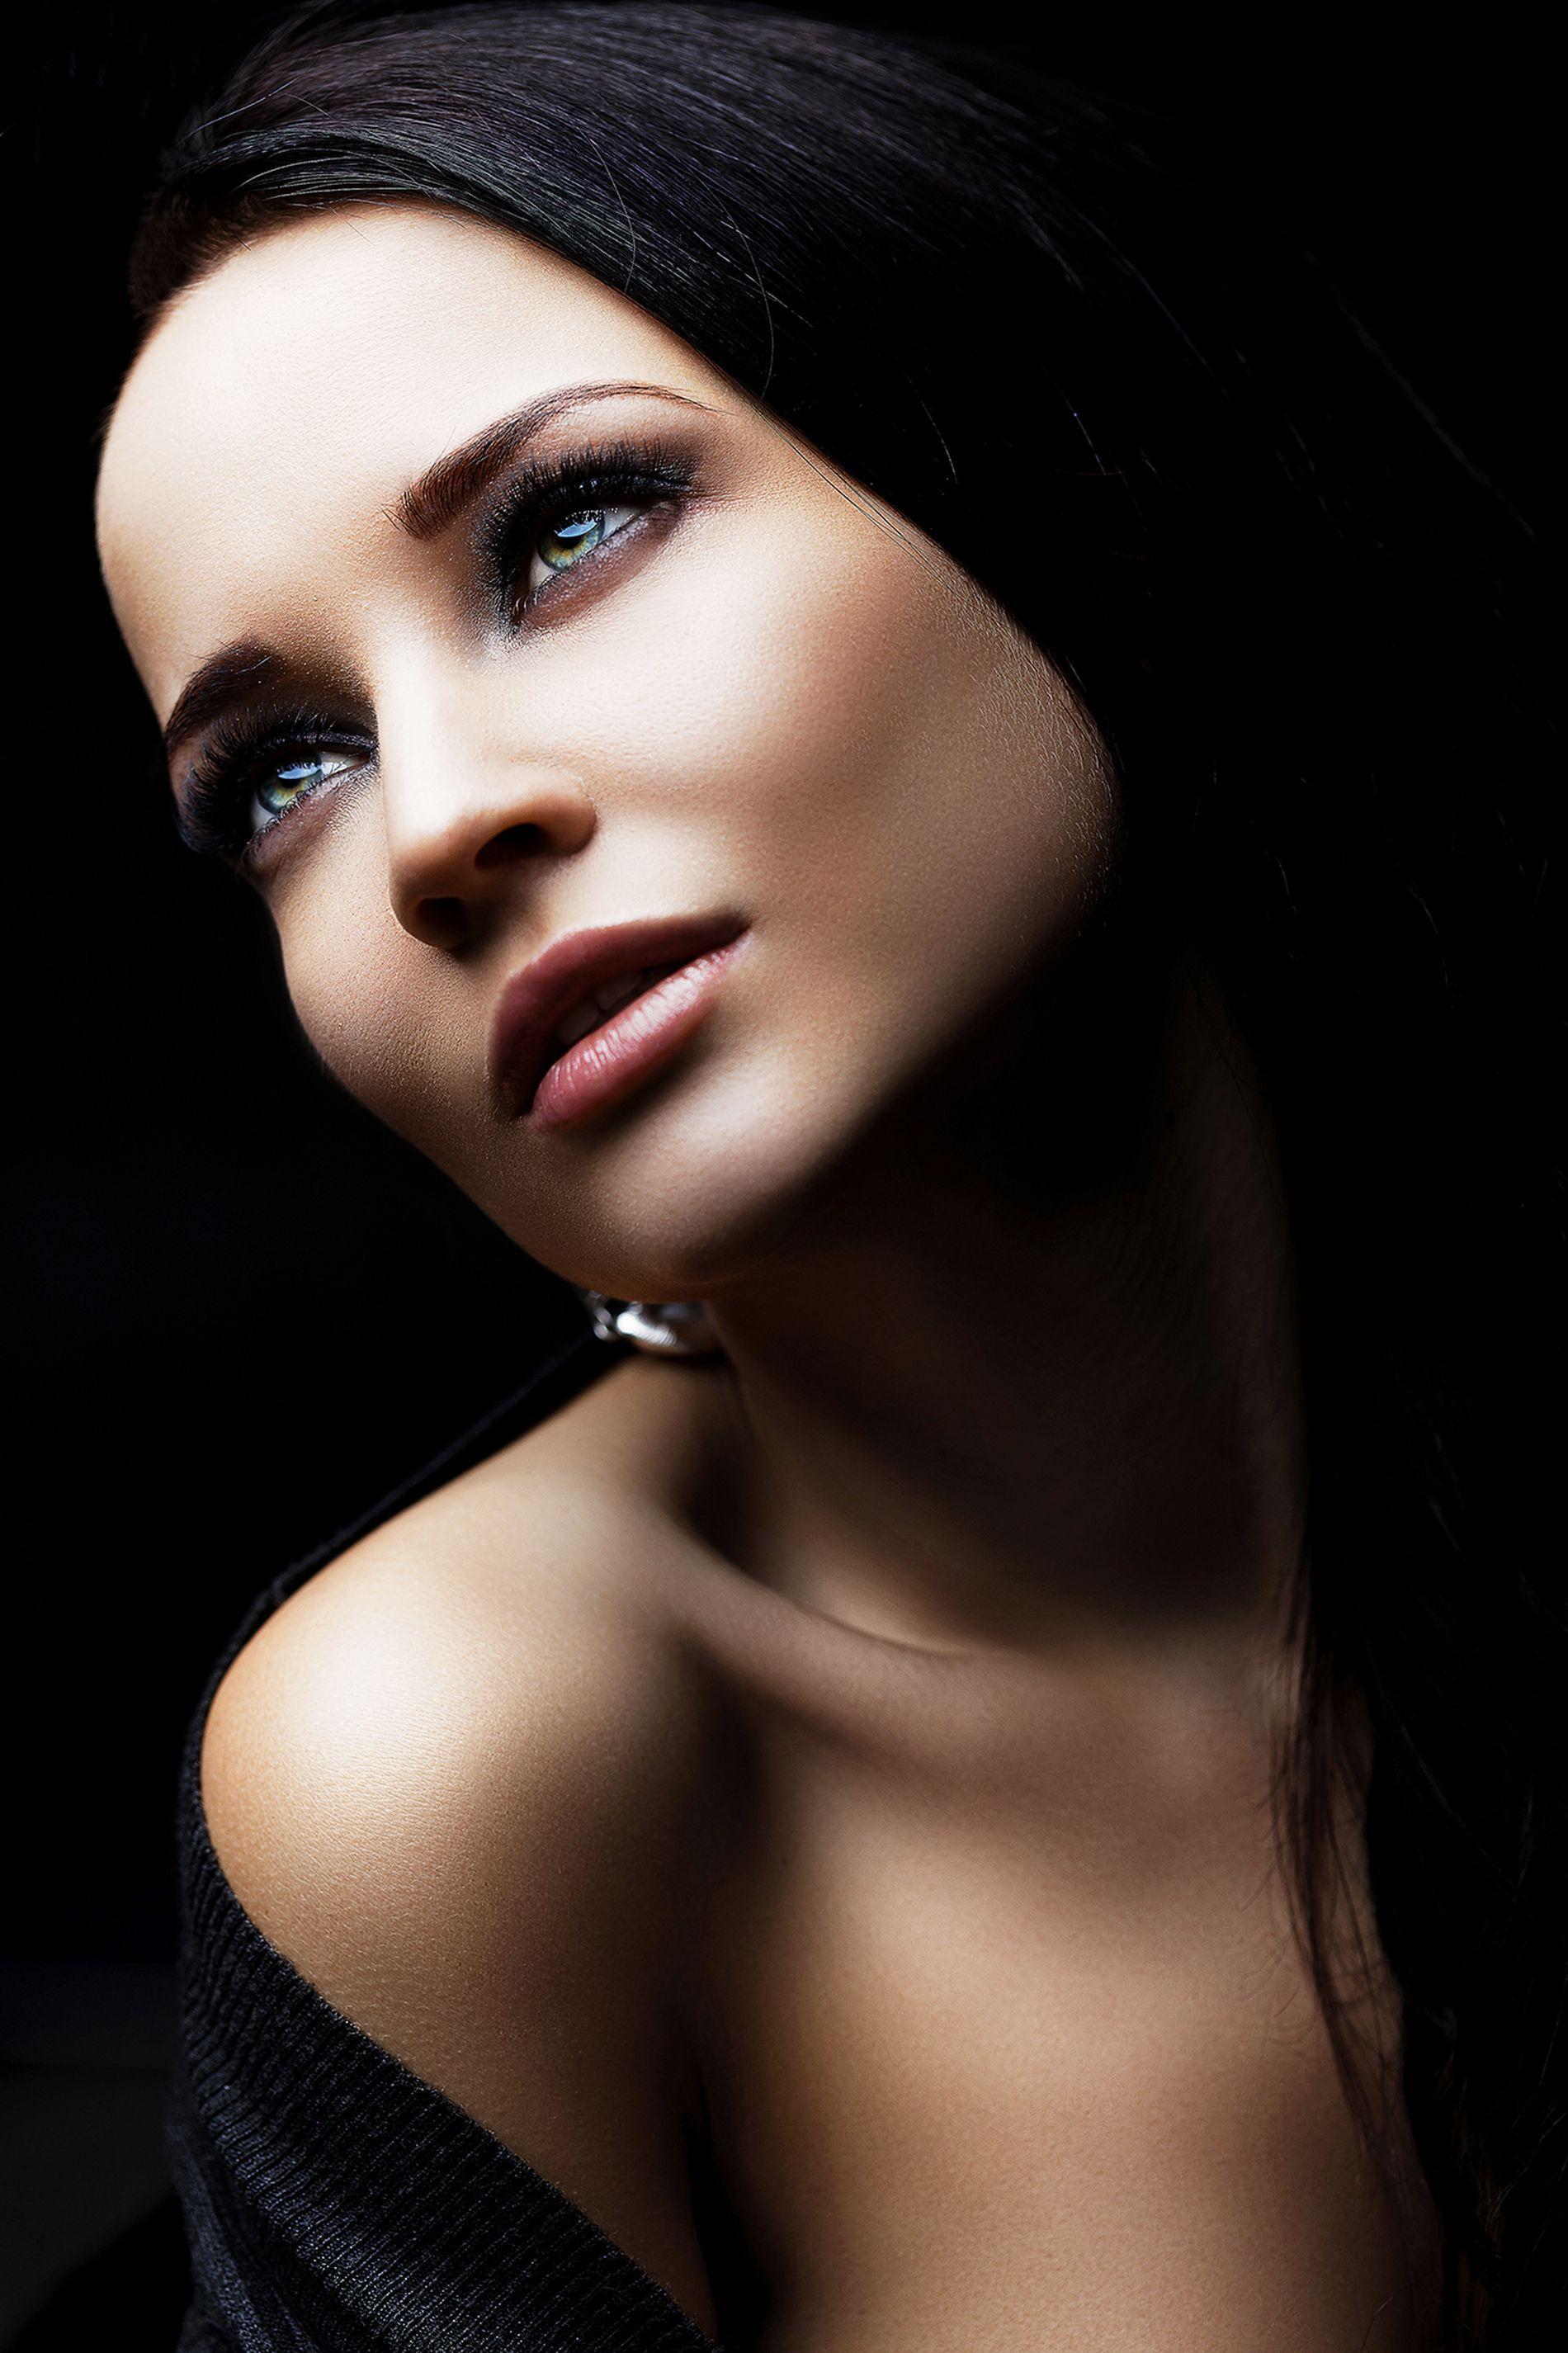 Perfect Ukrainian Model by Chris -Photos-International